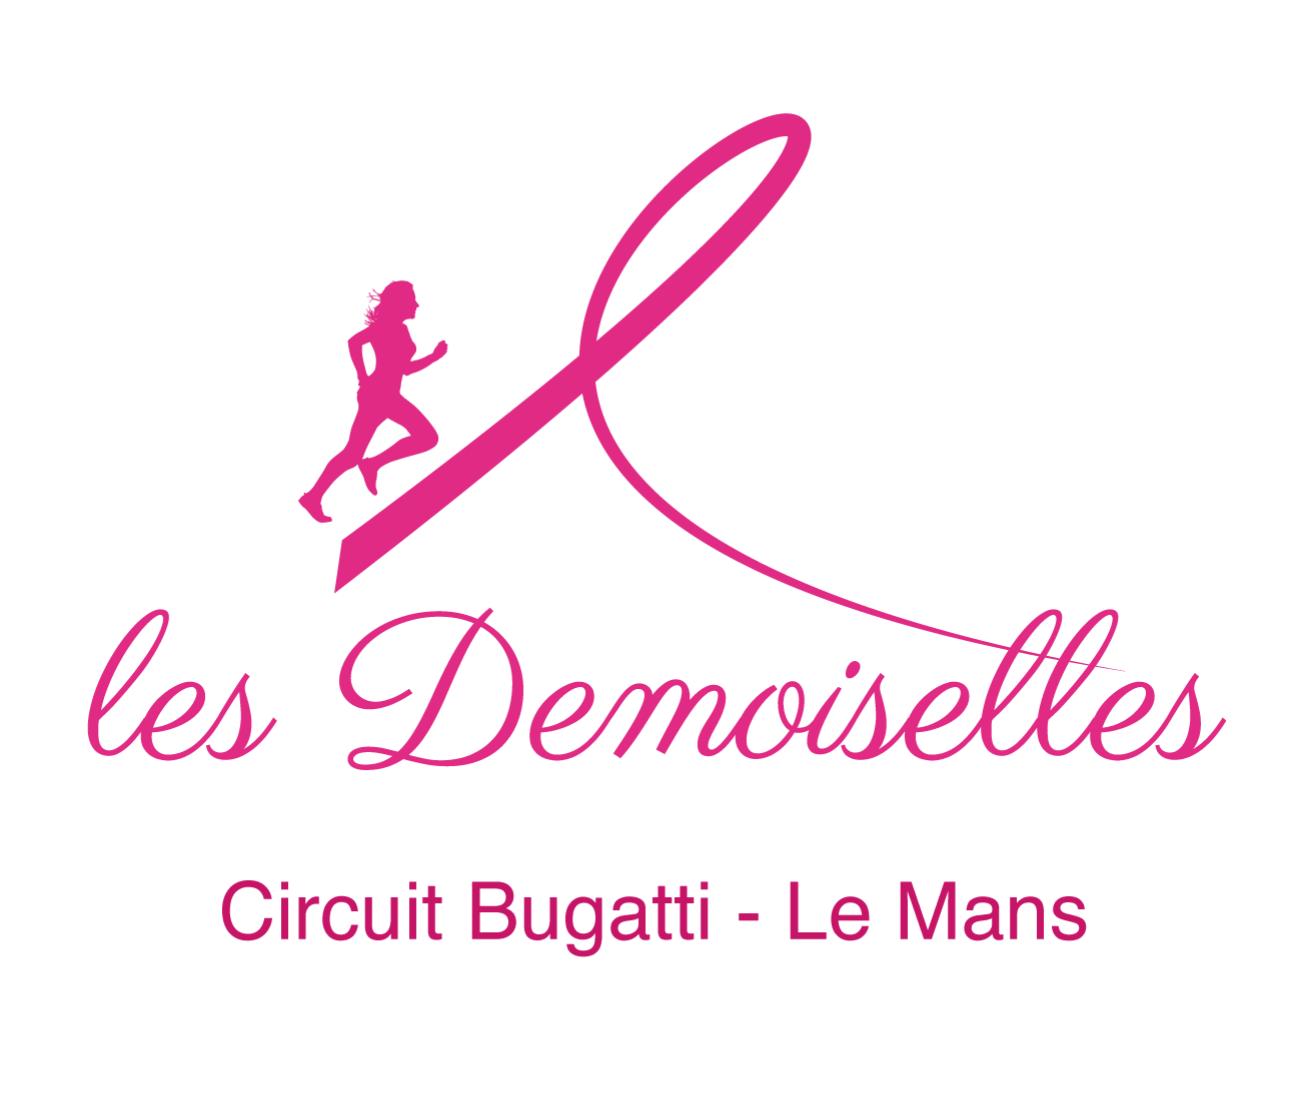 Les Demoiselles du Bugatti